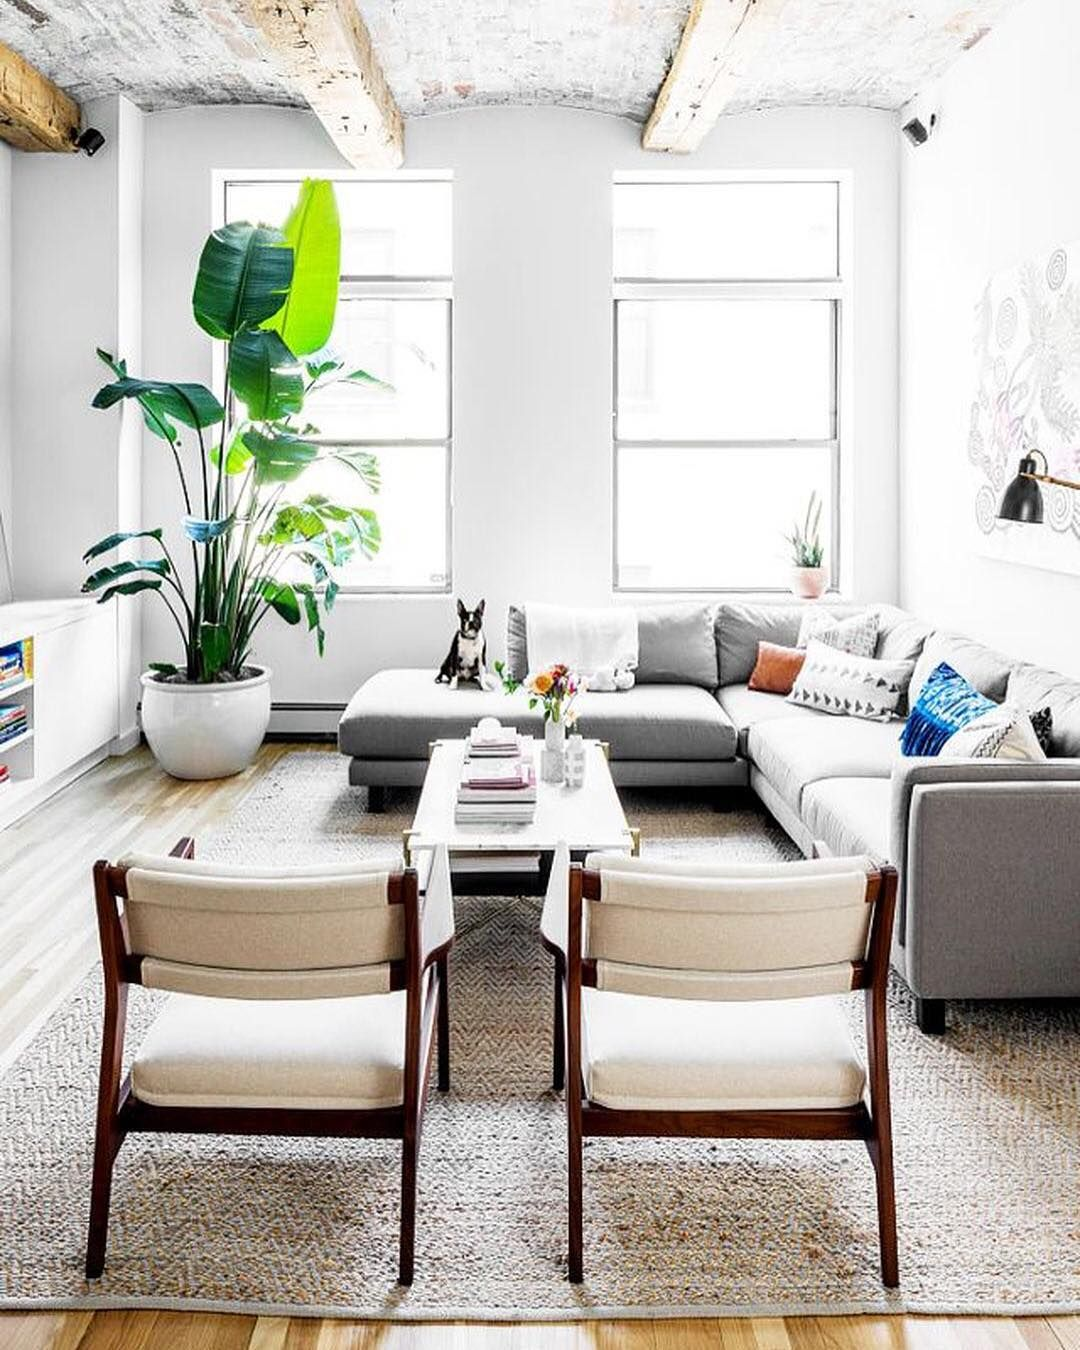 Loft Spaces We asked interior designers